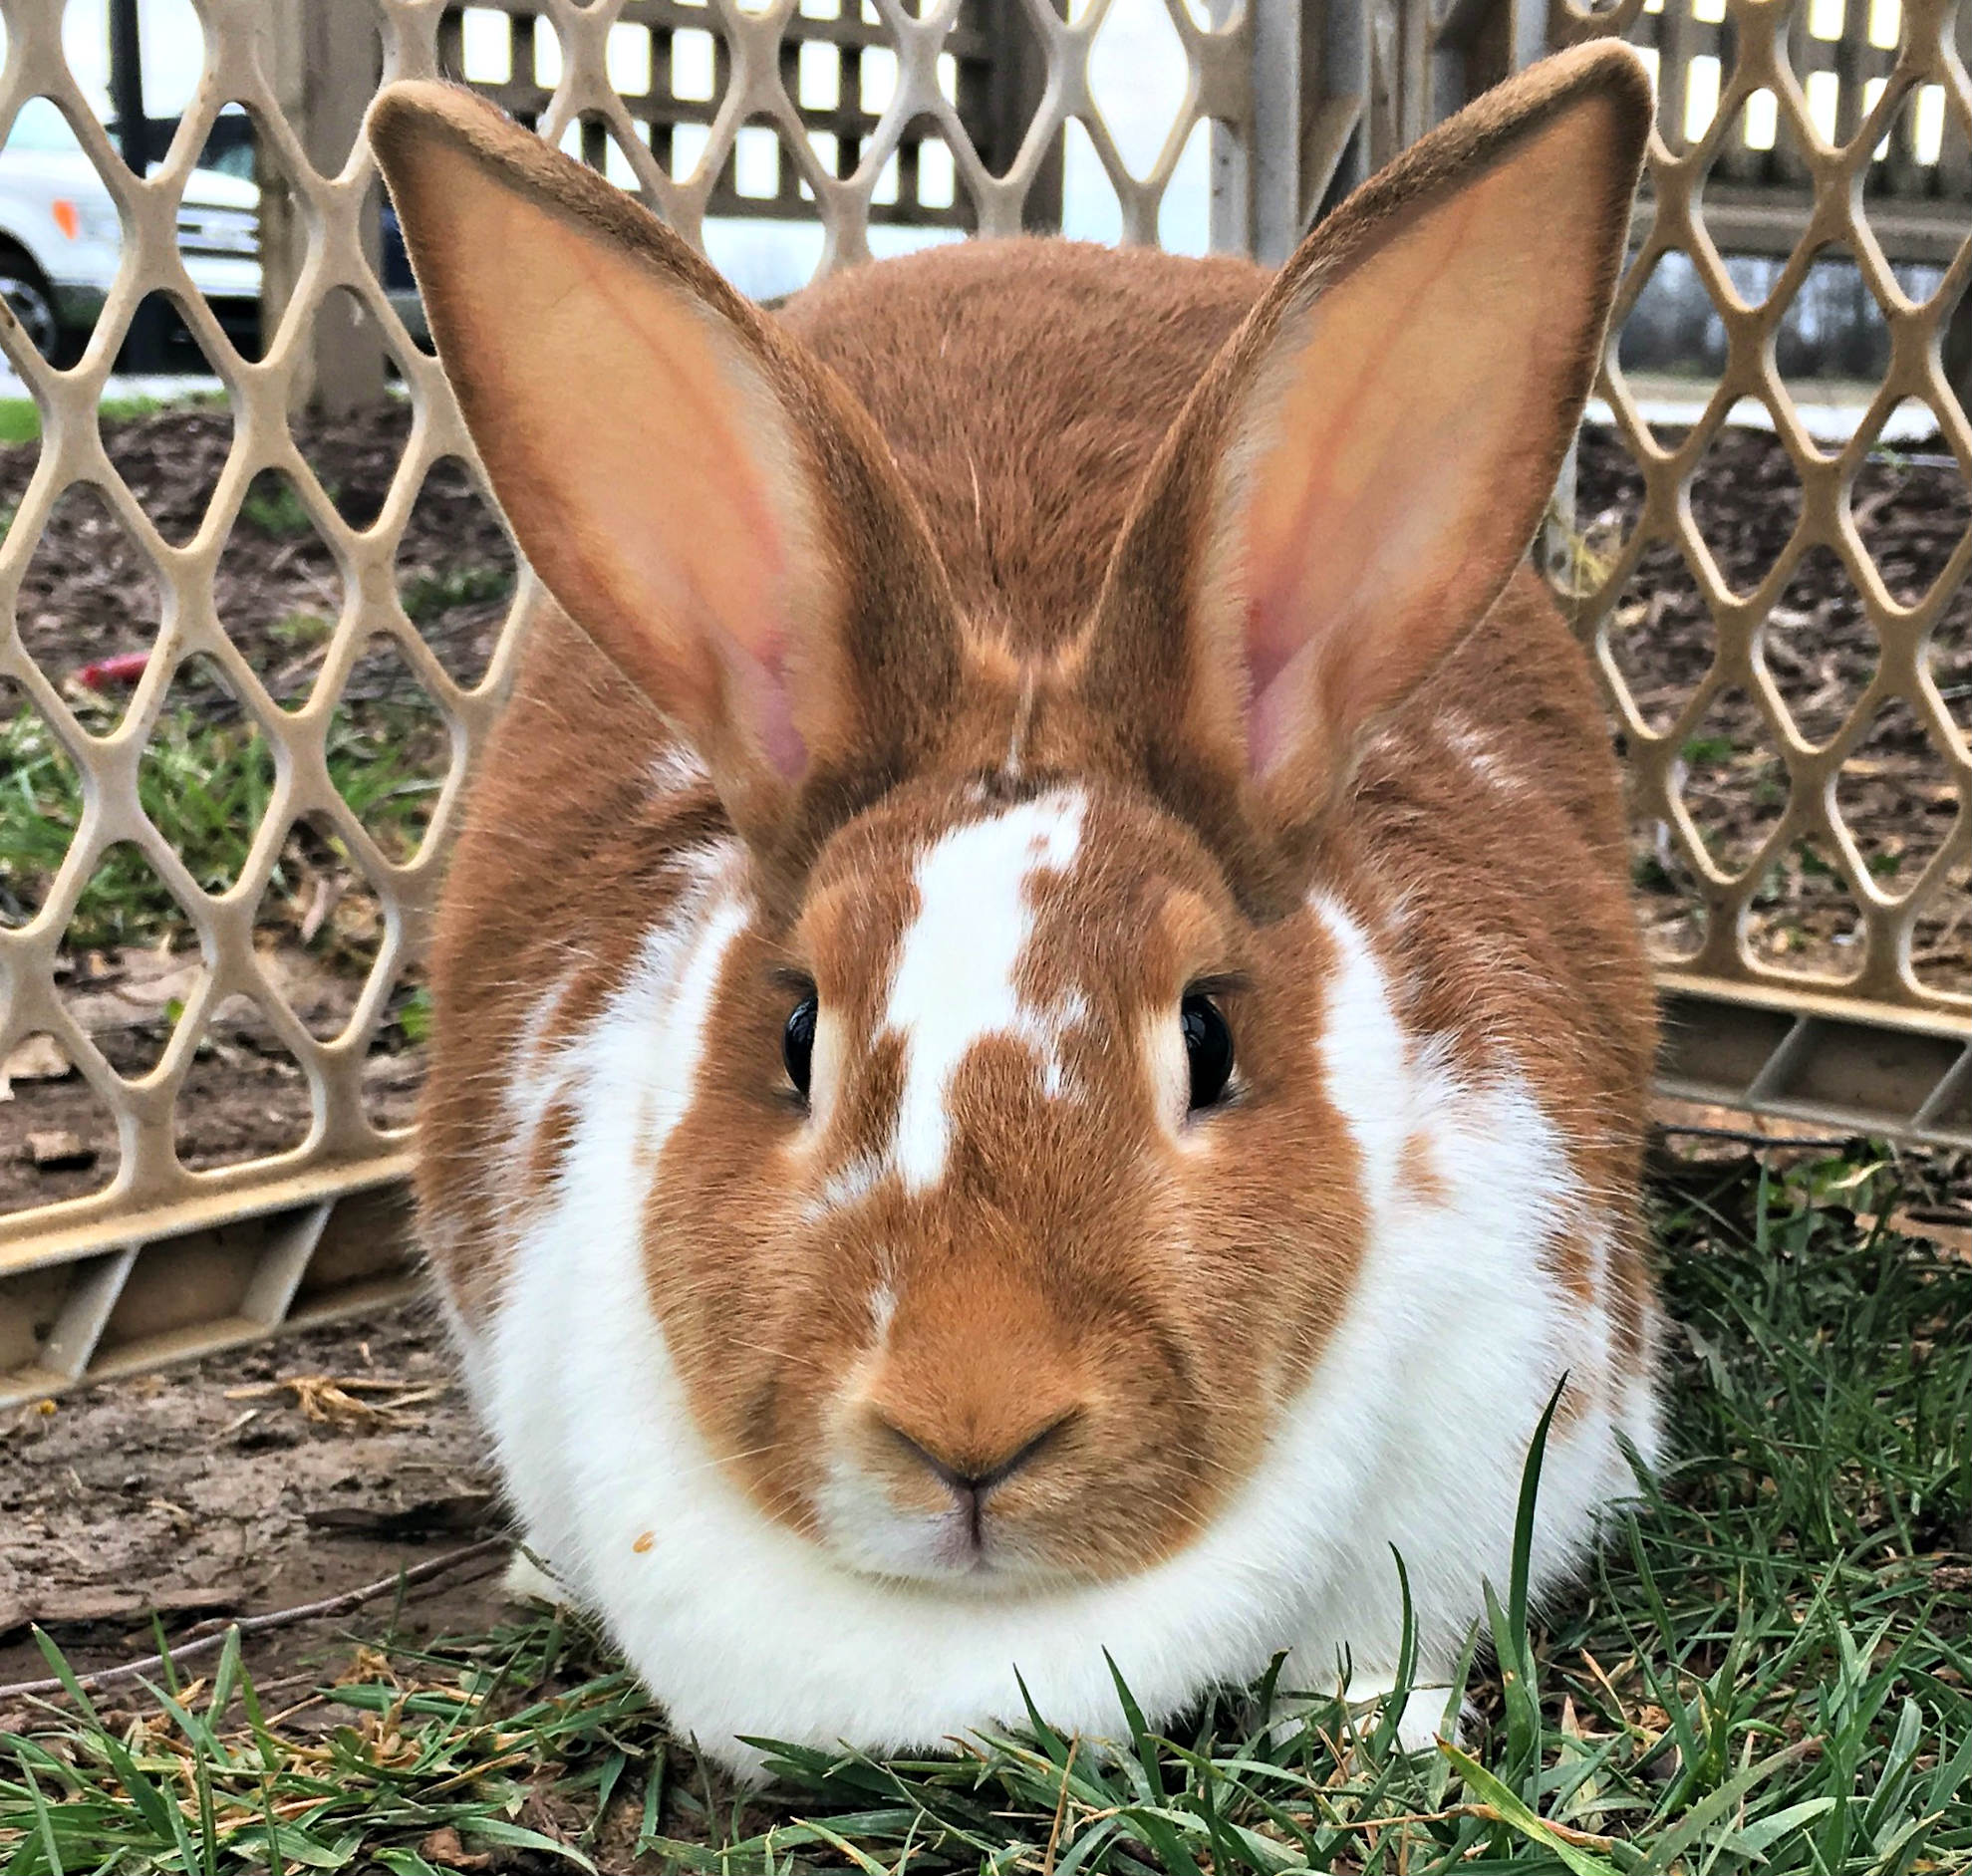 Why do rabbits dream